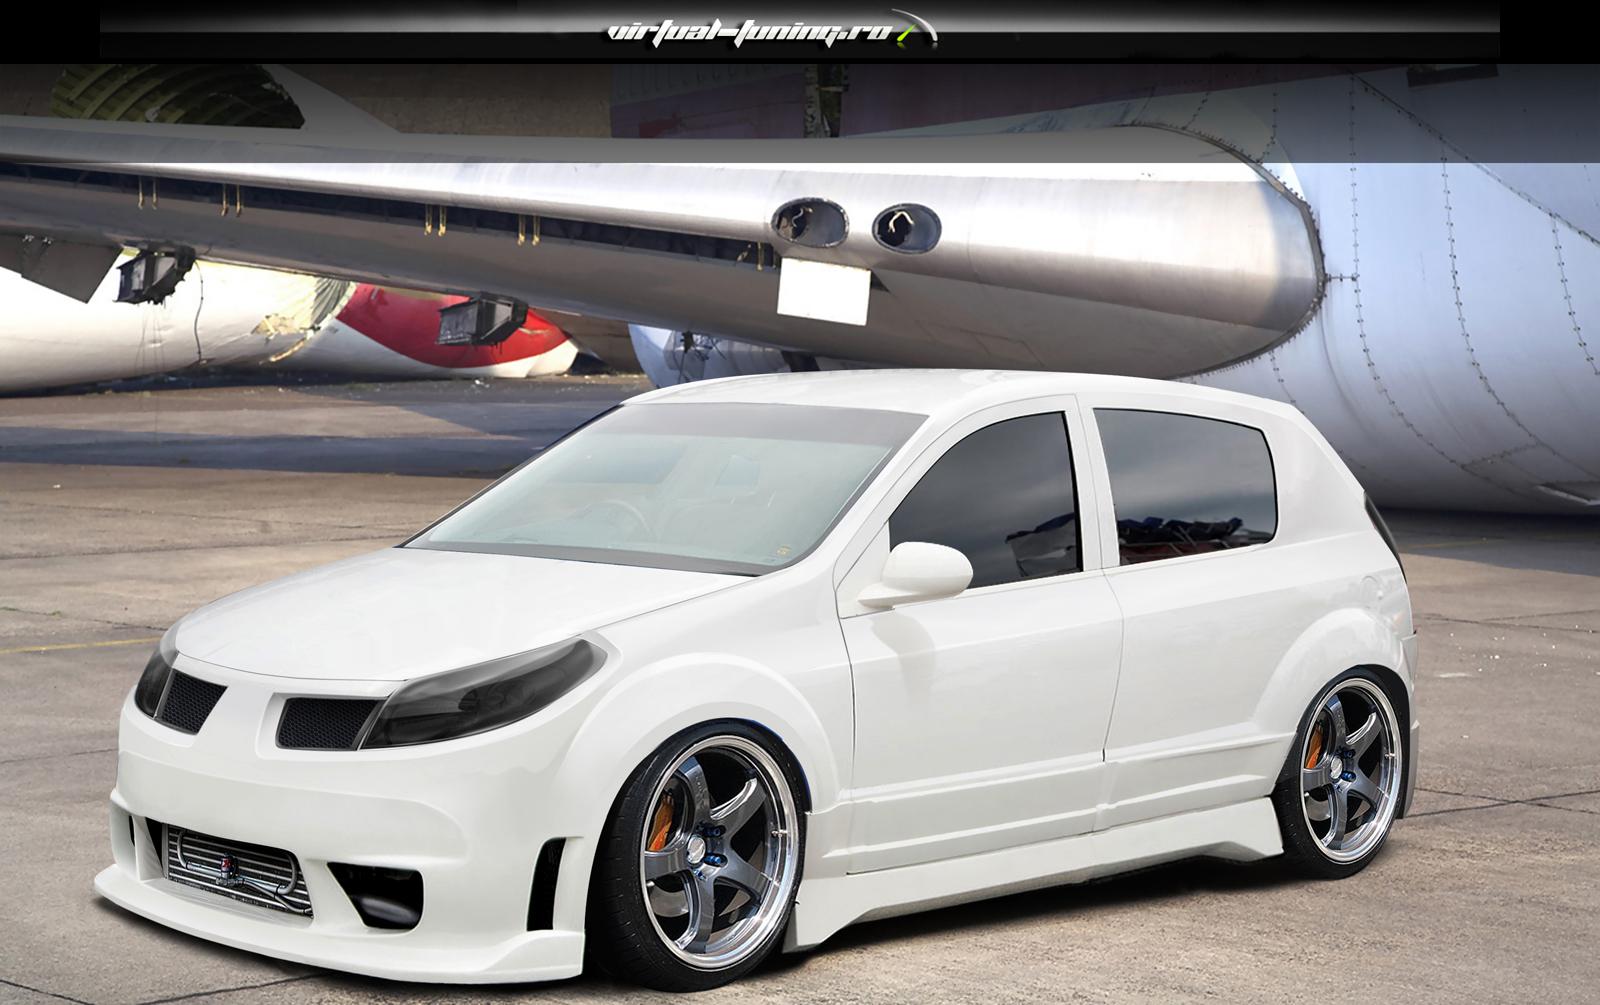 cars blog: DACIA wallpapers